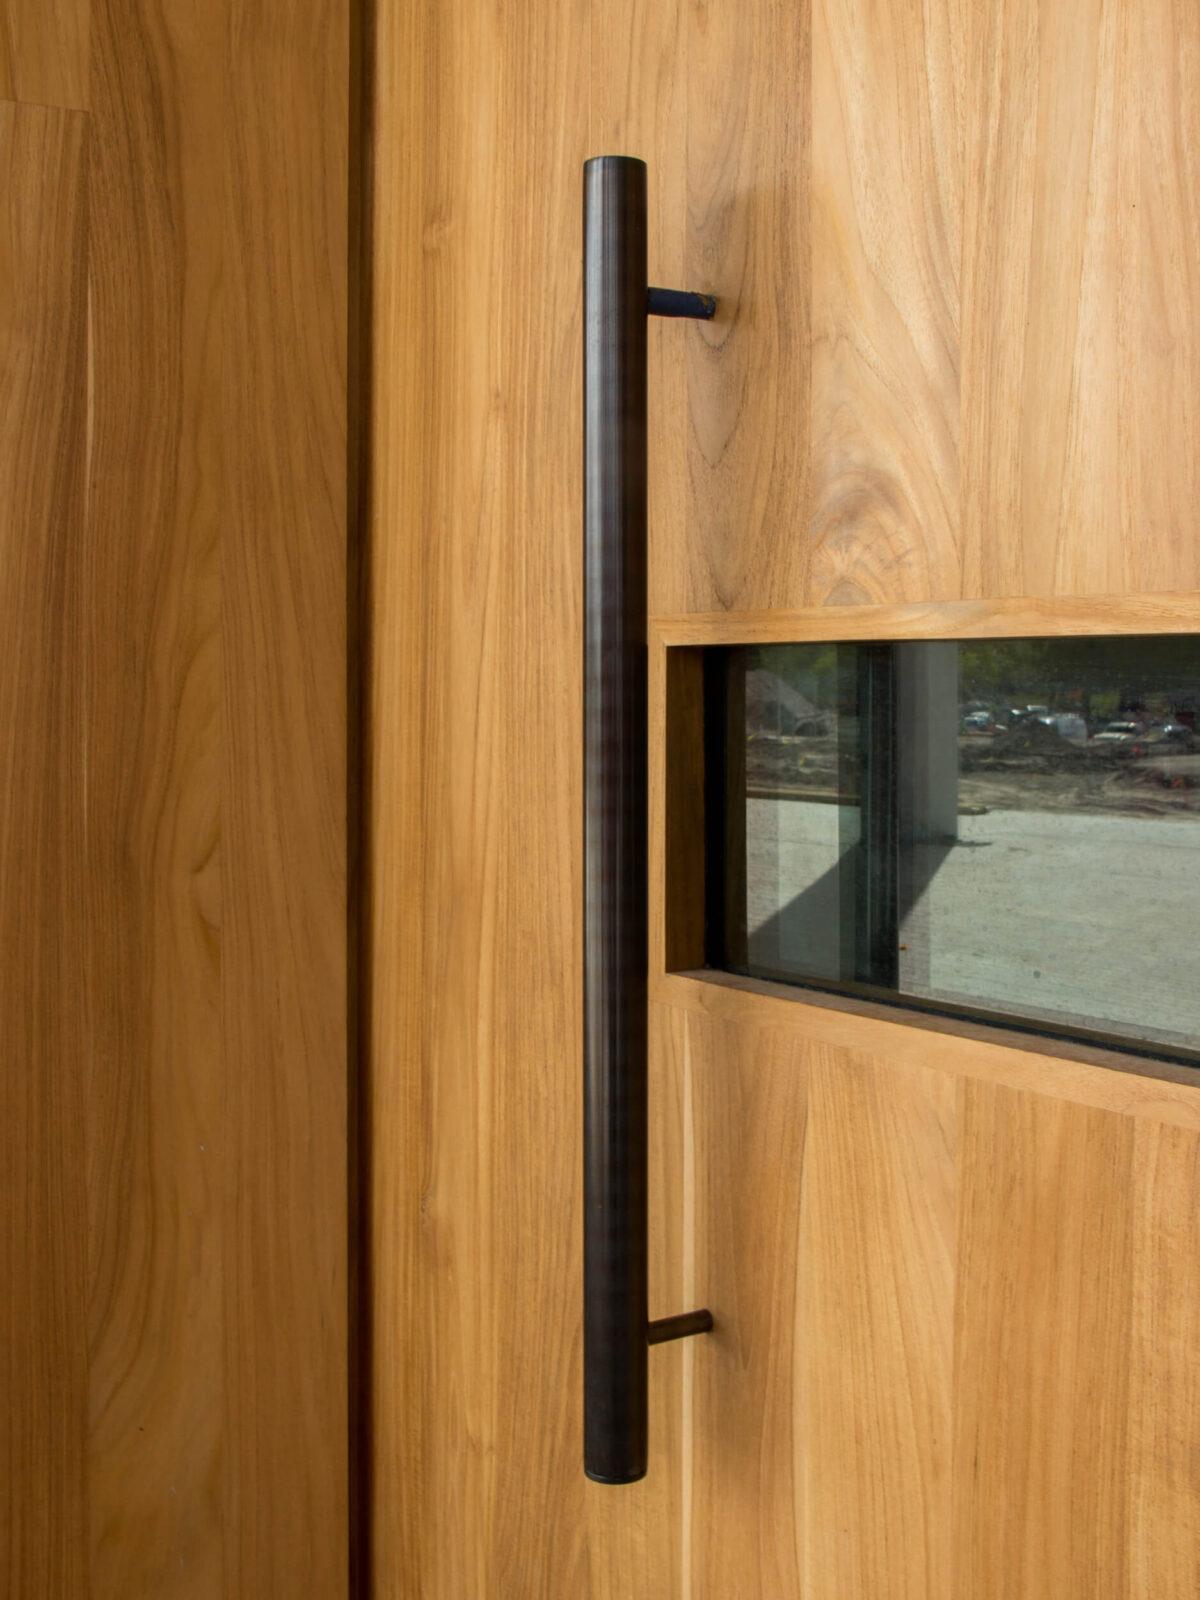 TEAK DOORS. DETAIL OF CUSTOM MANUFACTURED PULL.